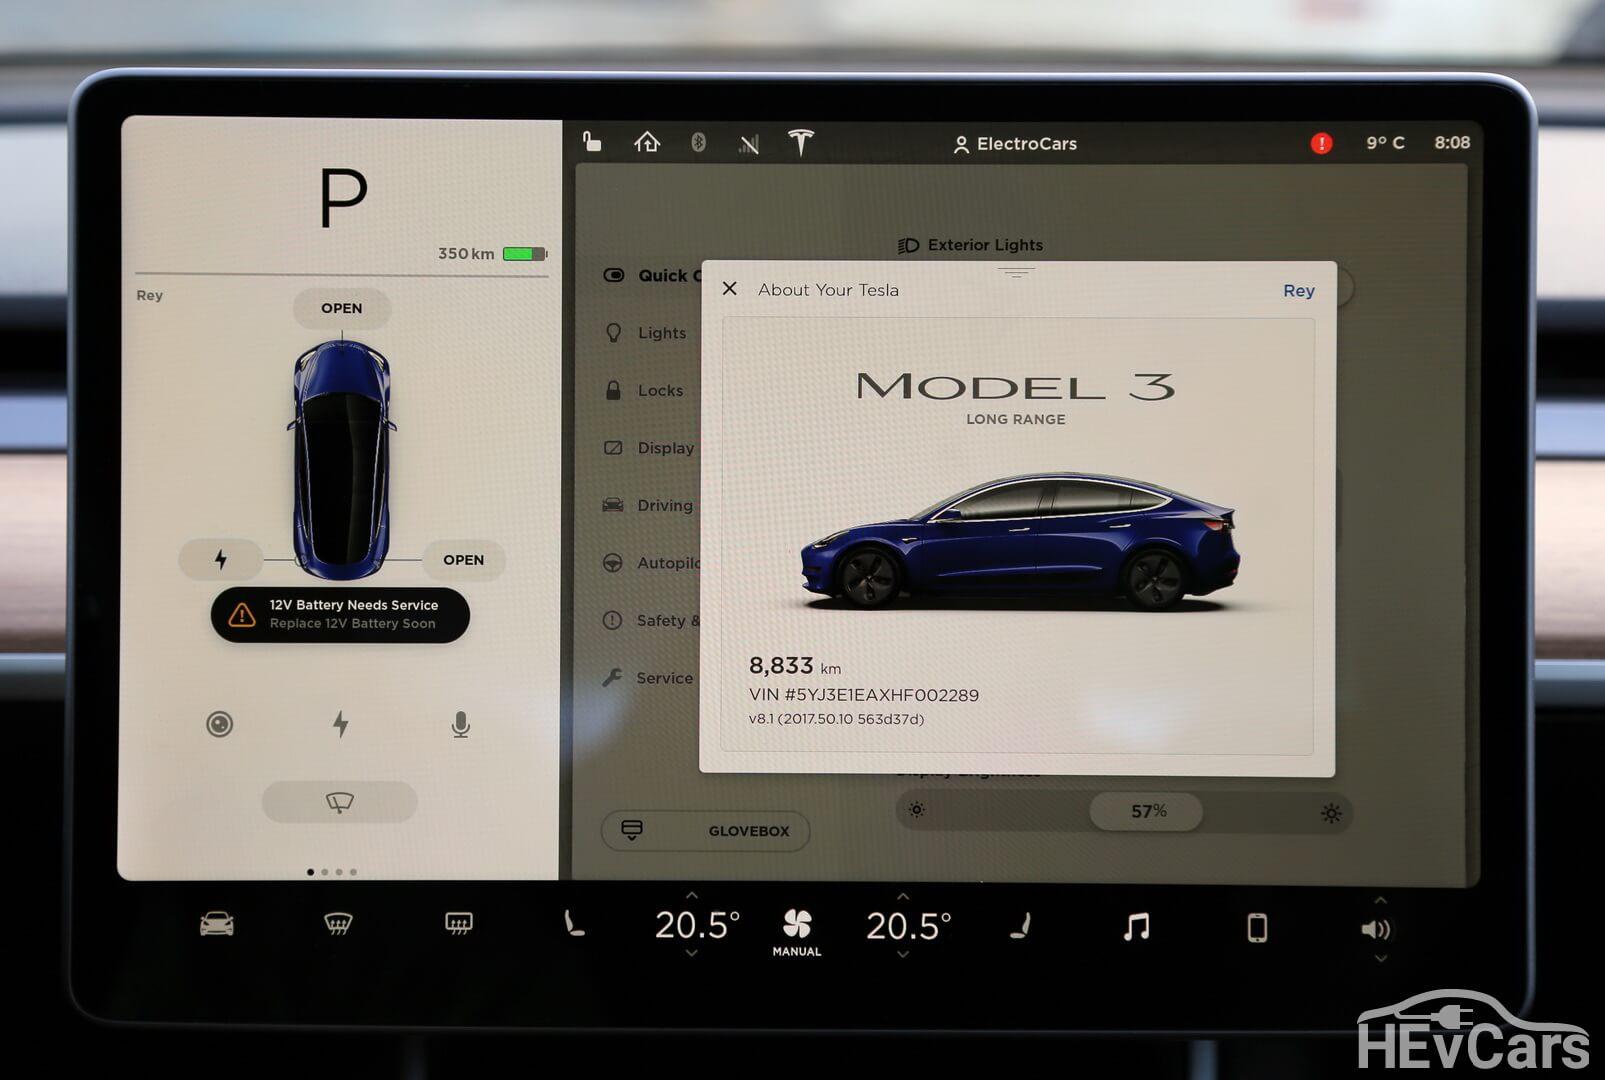 Надпись на дисплее Tesla Model 3 Long Range